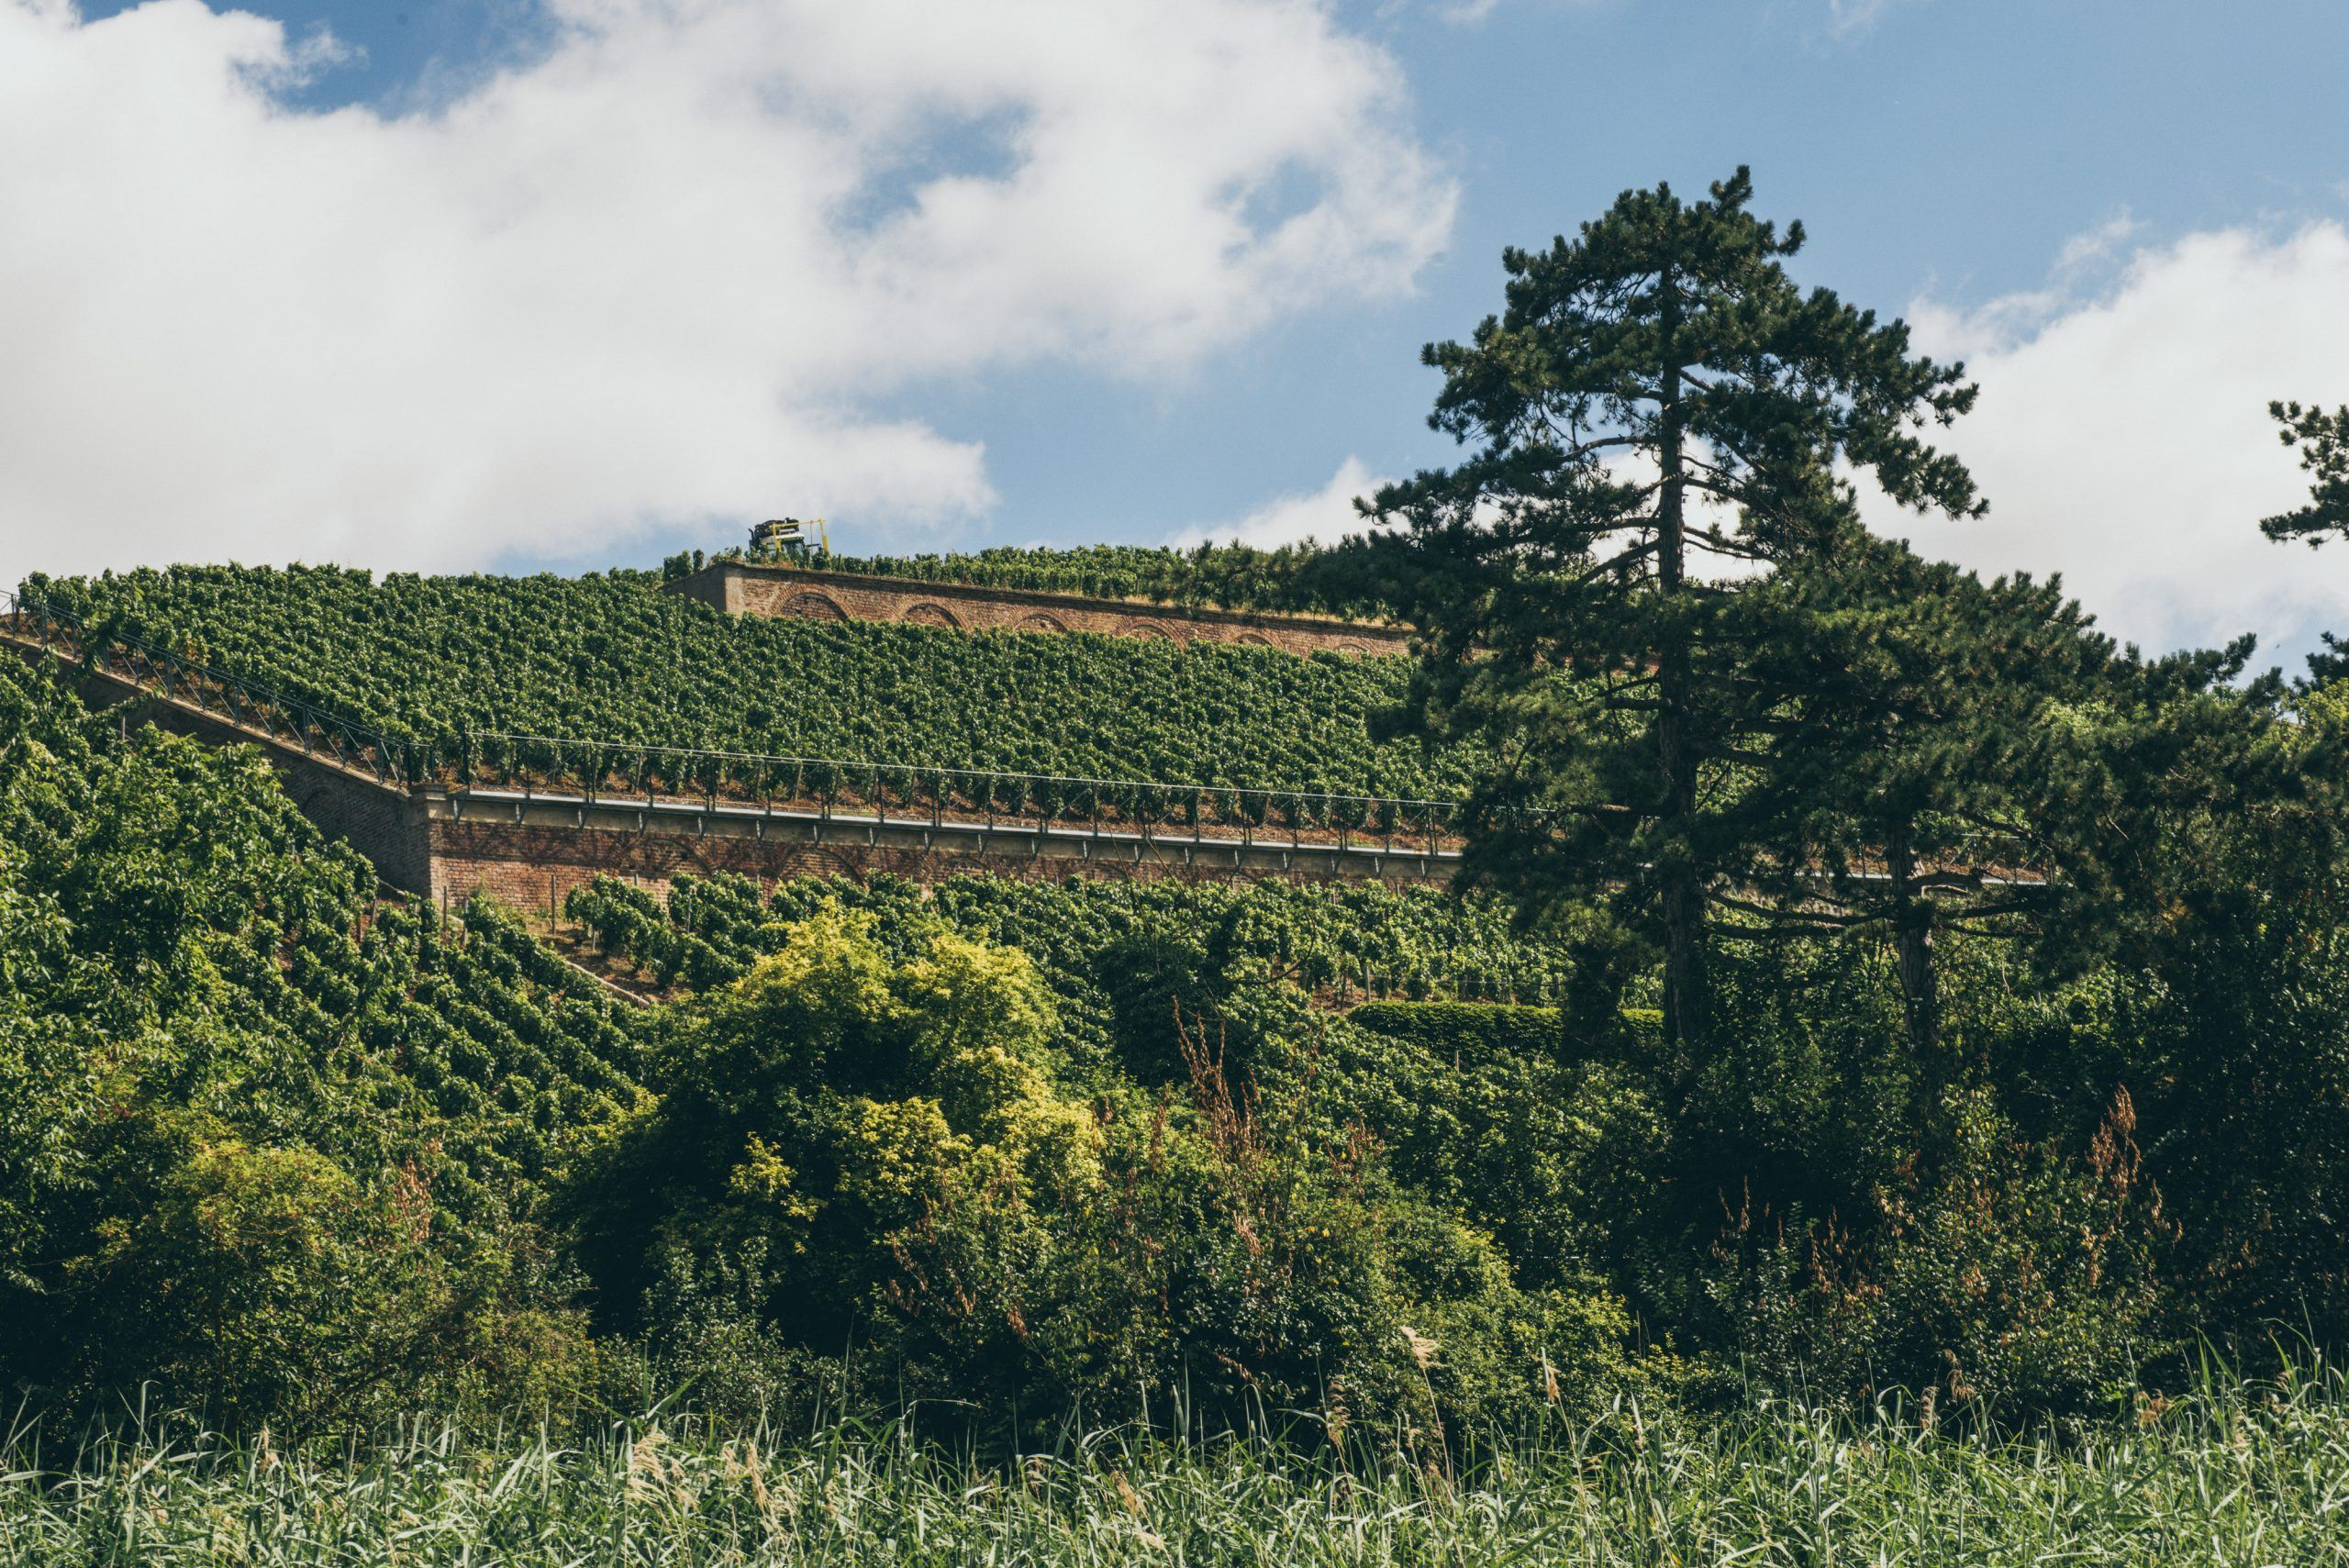 Clos des Goisses L.V. Extra Brut 1992 - Champagne Philipponnat